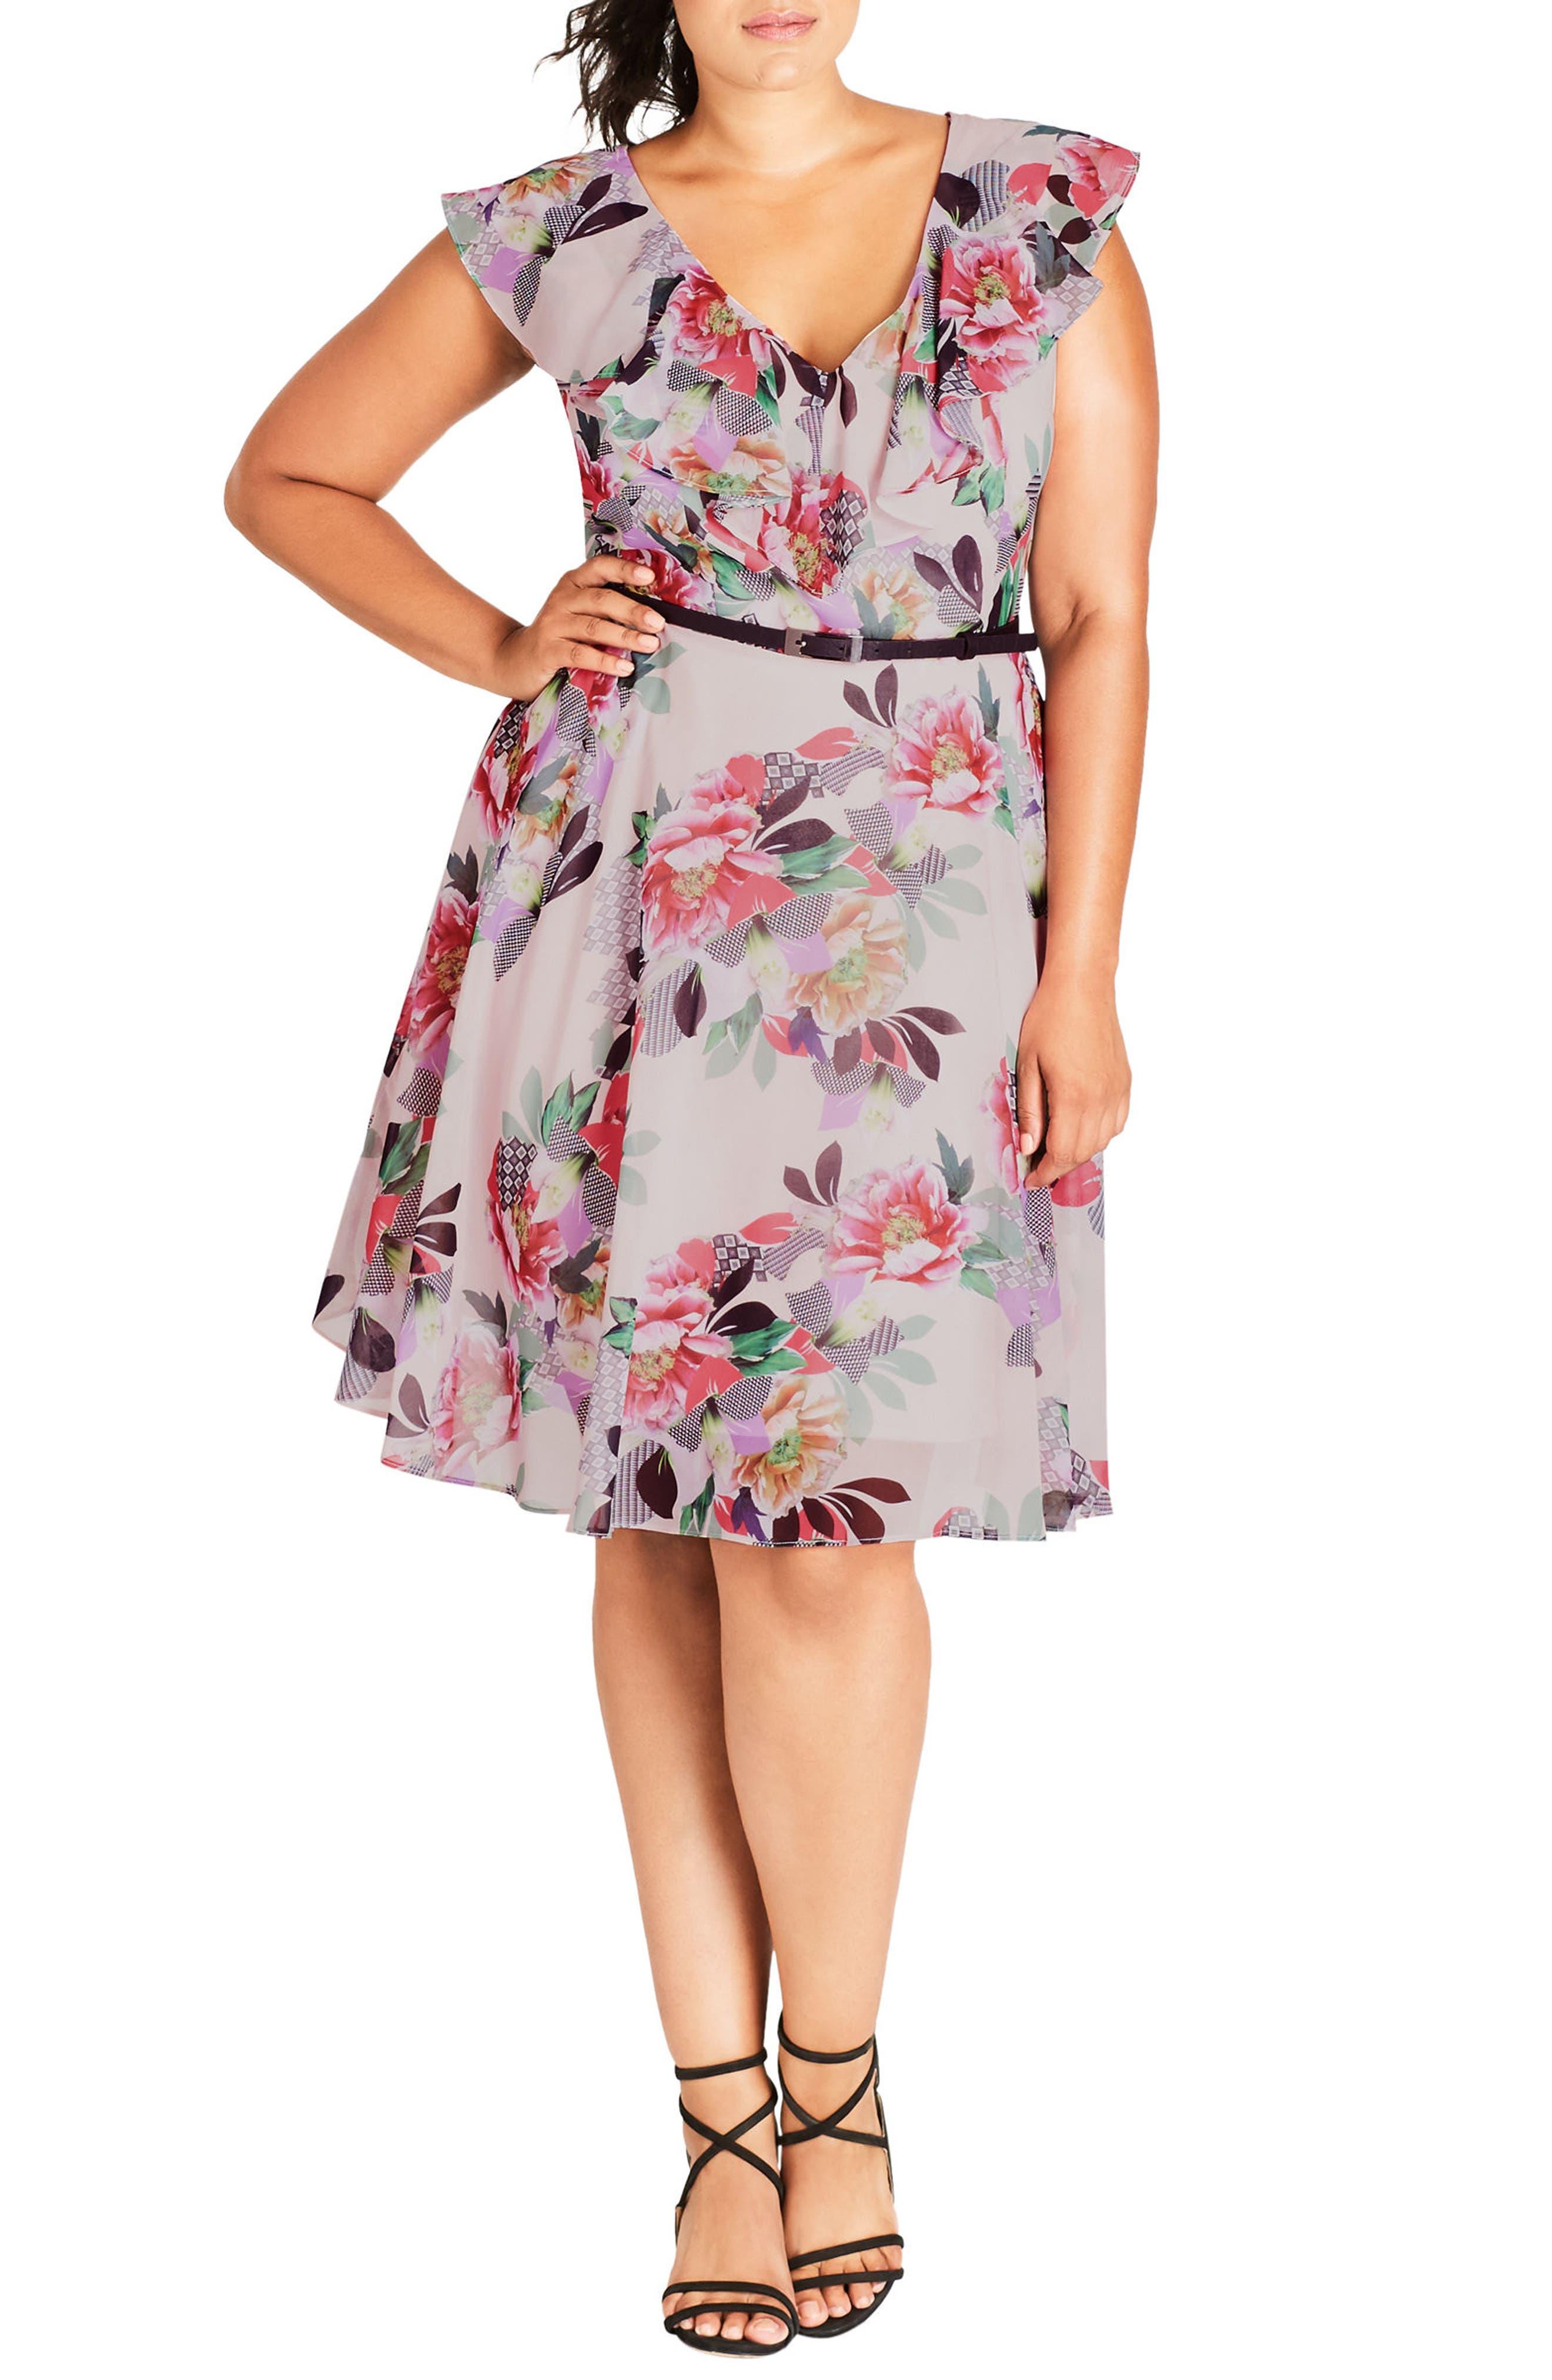 Main Image - City Chic Romance Ruffle Floral Fit & Flare Dress (Plus Size)